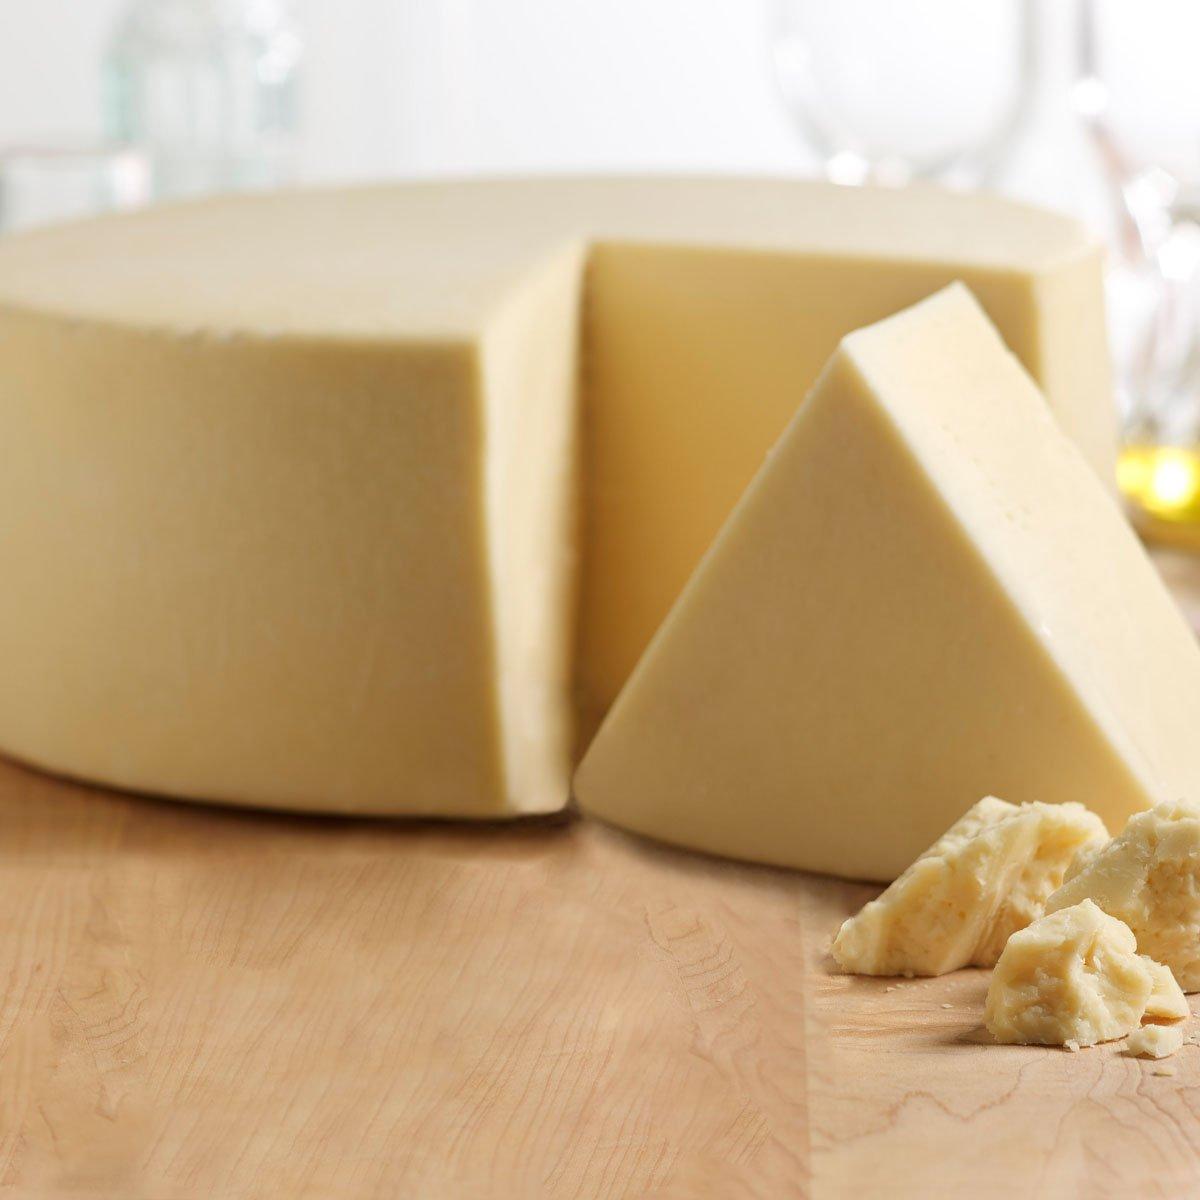 Asiago Cheese Block